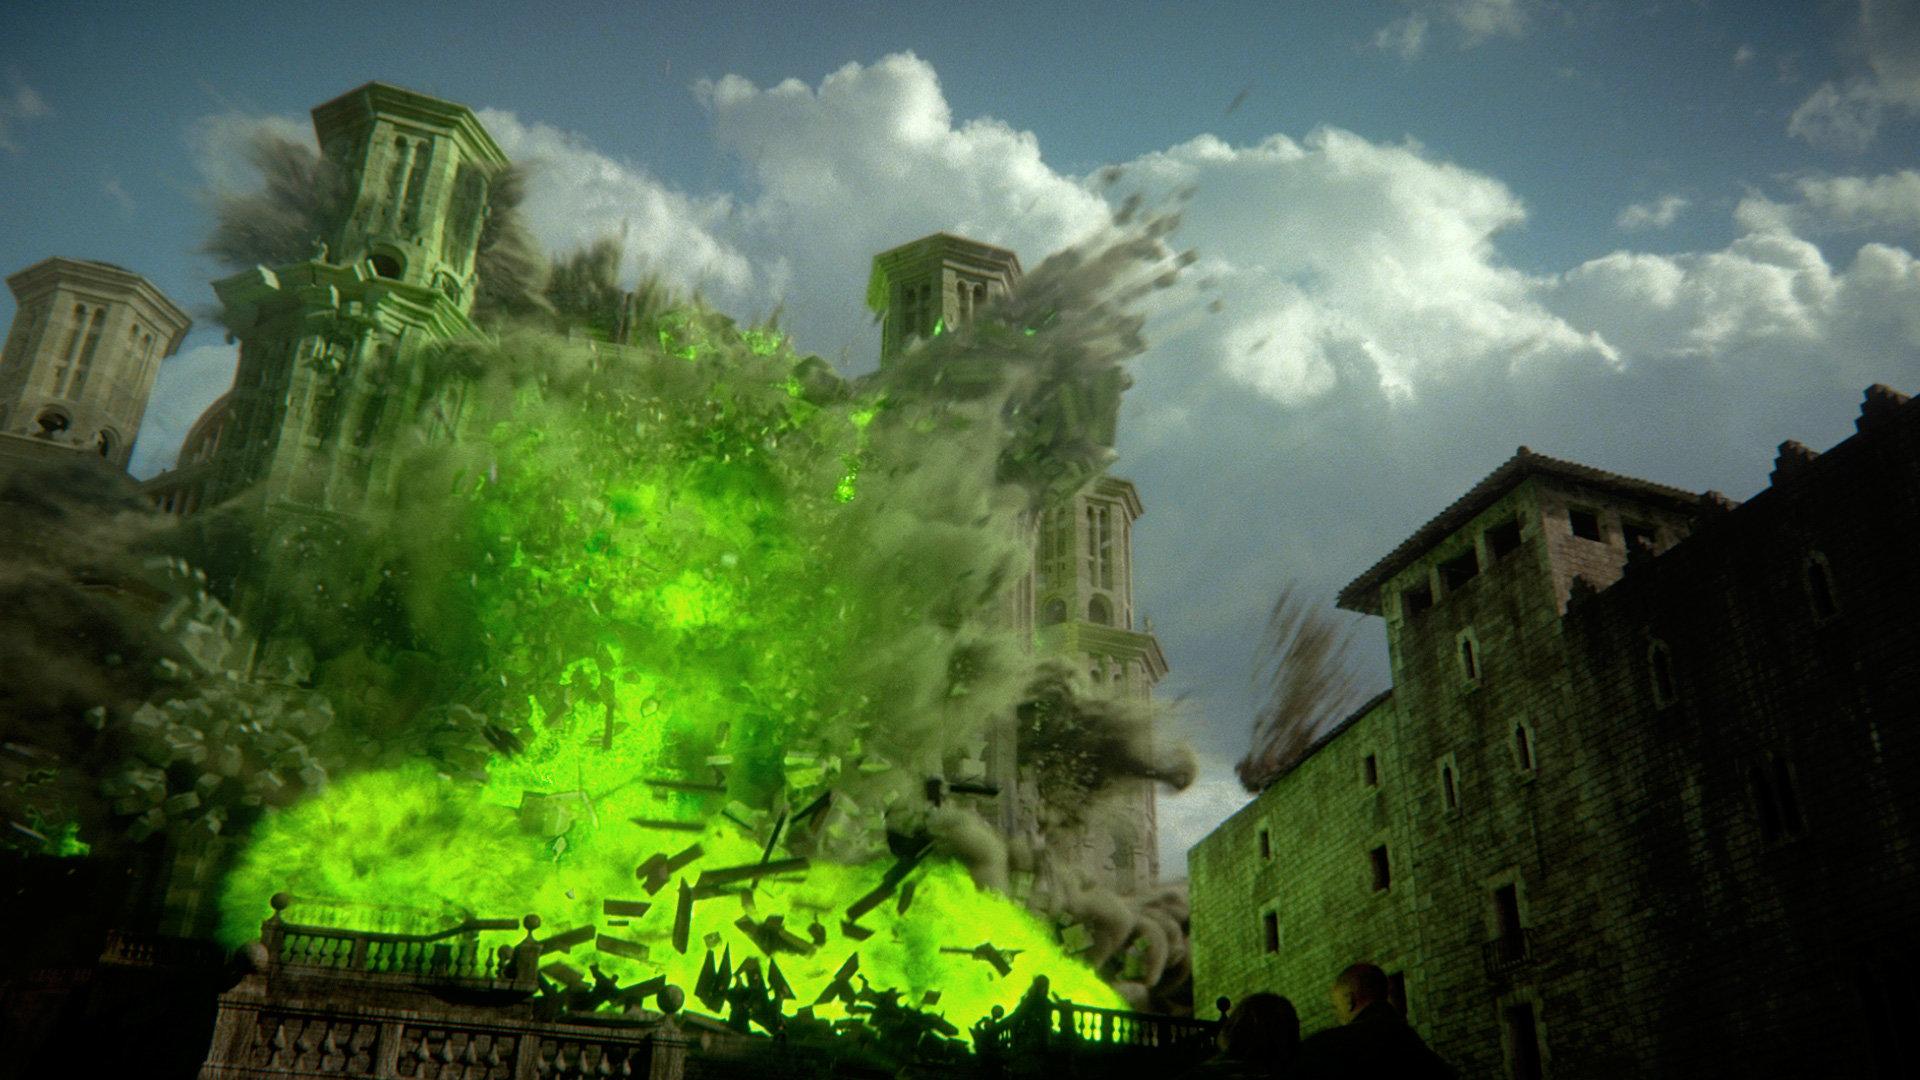 High Resolution Game Of Thrones Full Hd Wallpaper ID383398 For Desktop